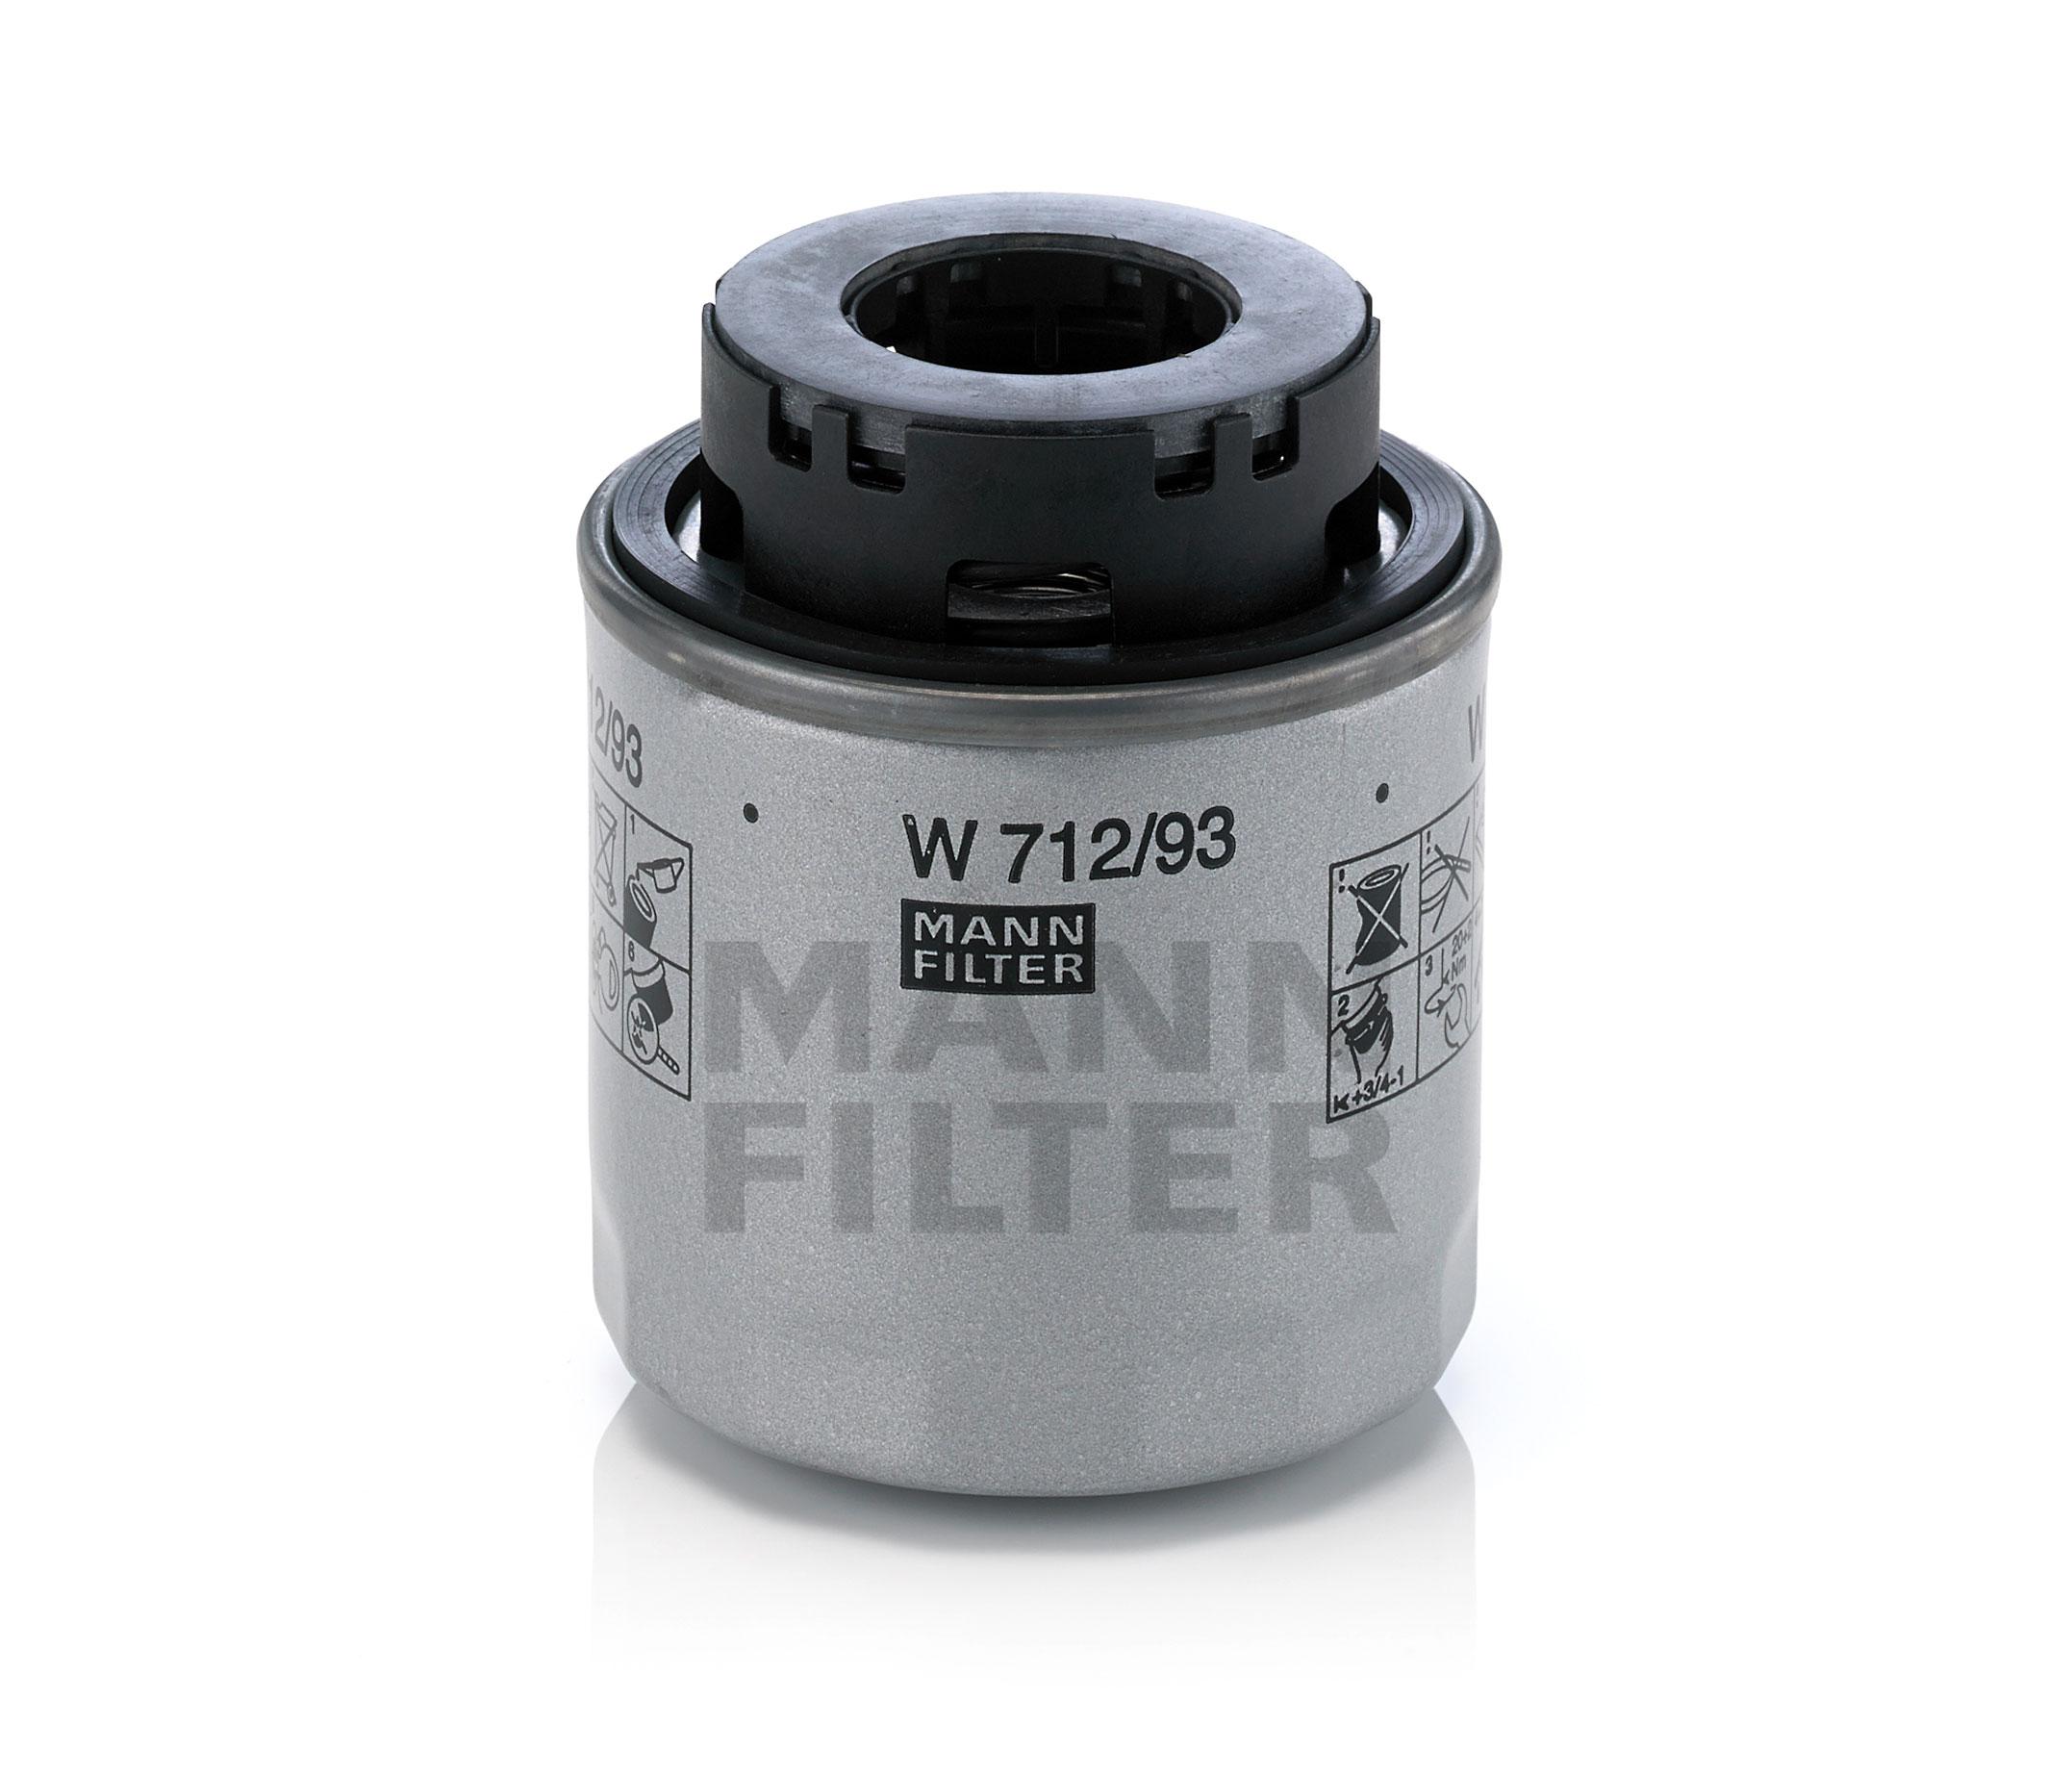 Mann Oil Filter W712  93 Fits Volkswagen Golf 1 2 Tsi Mk6  77kw   1 4 Tsi Mk6